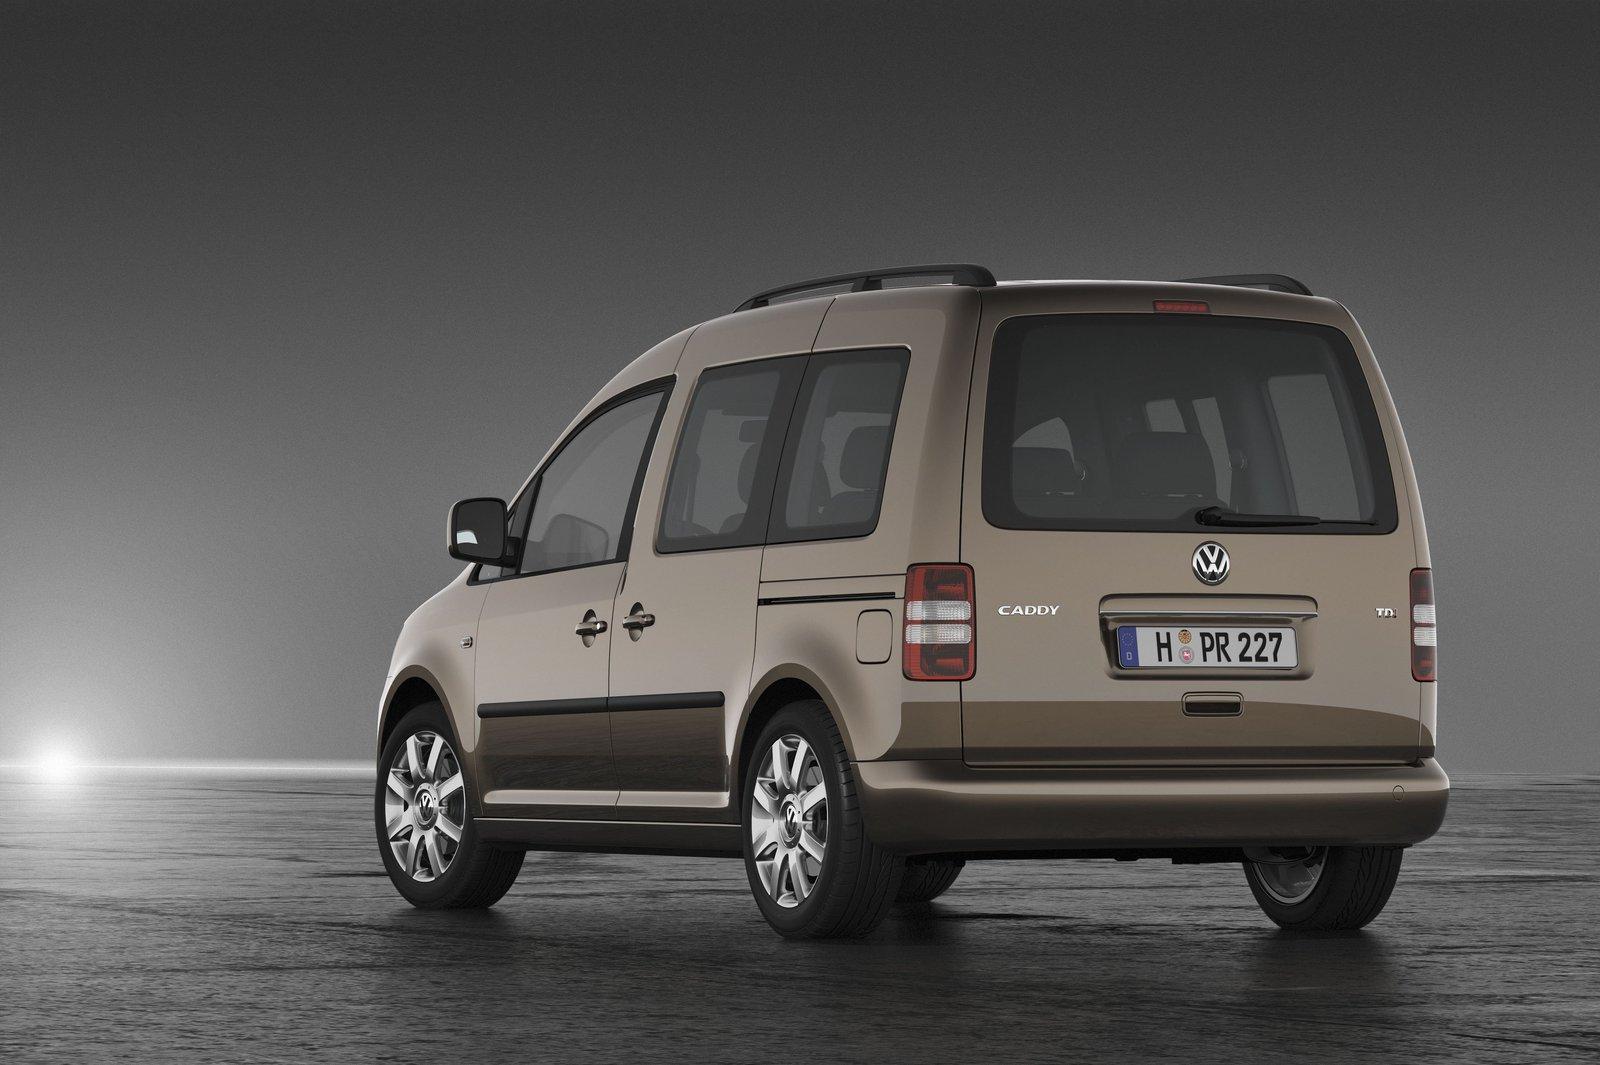 Volkswagen Caddy III 2004 - 2010 Compact MPV #4